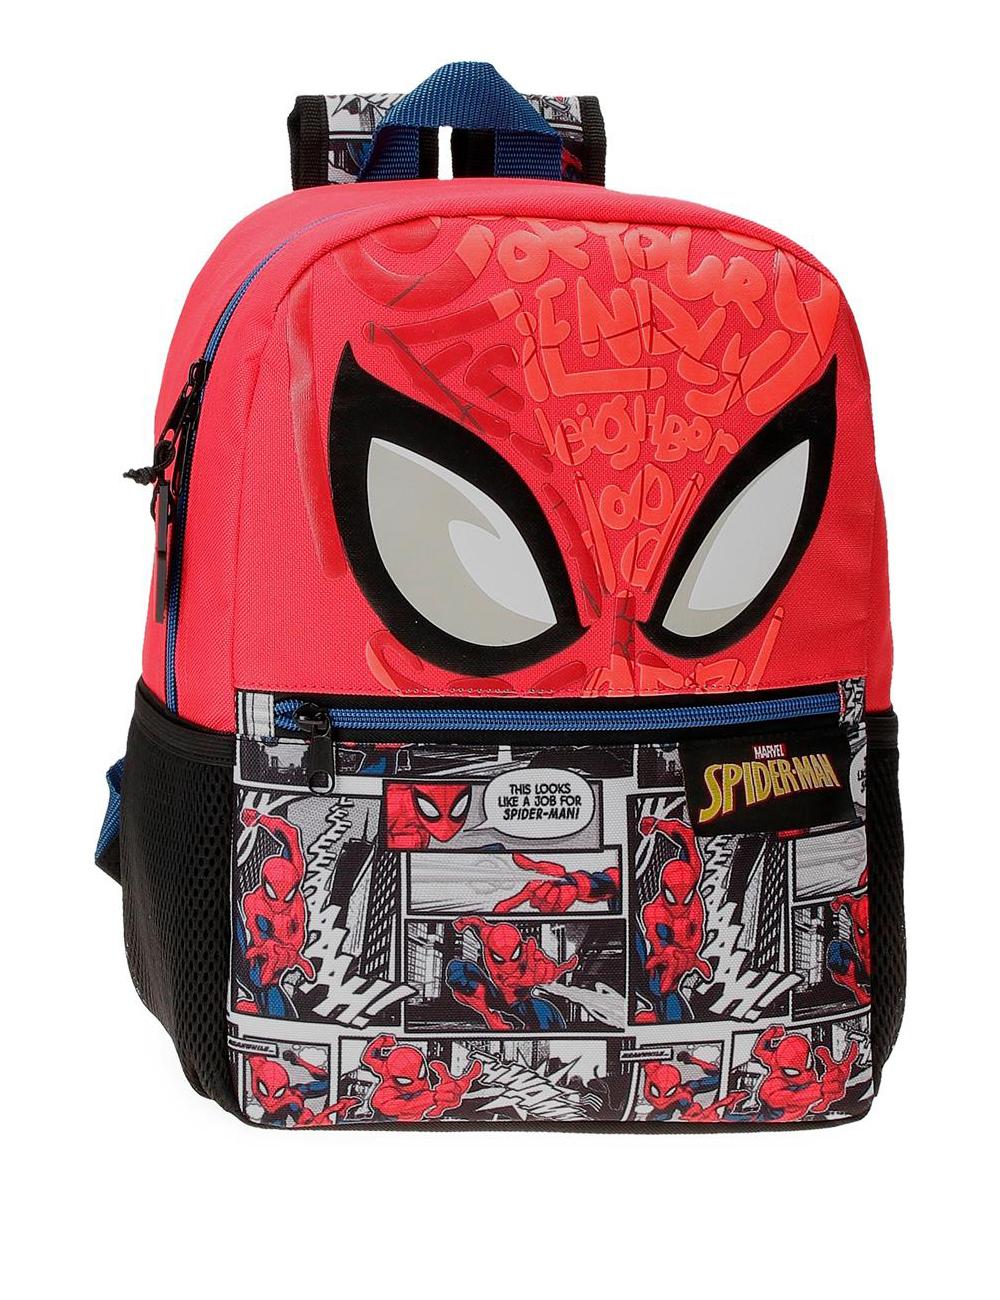 2252221 Mochila 32cm Spiderman Comic